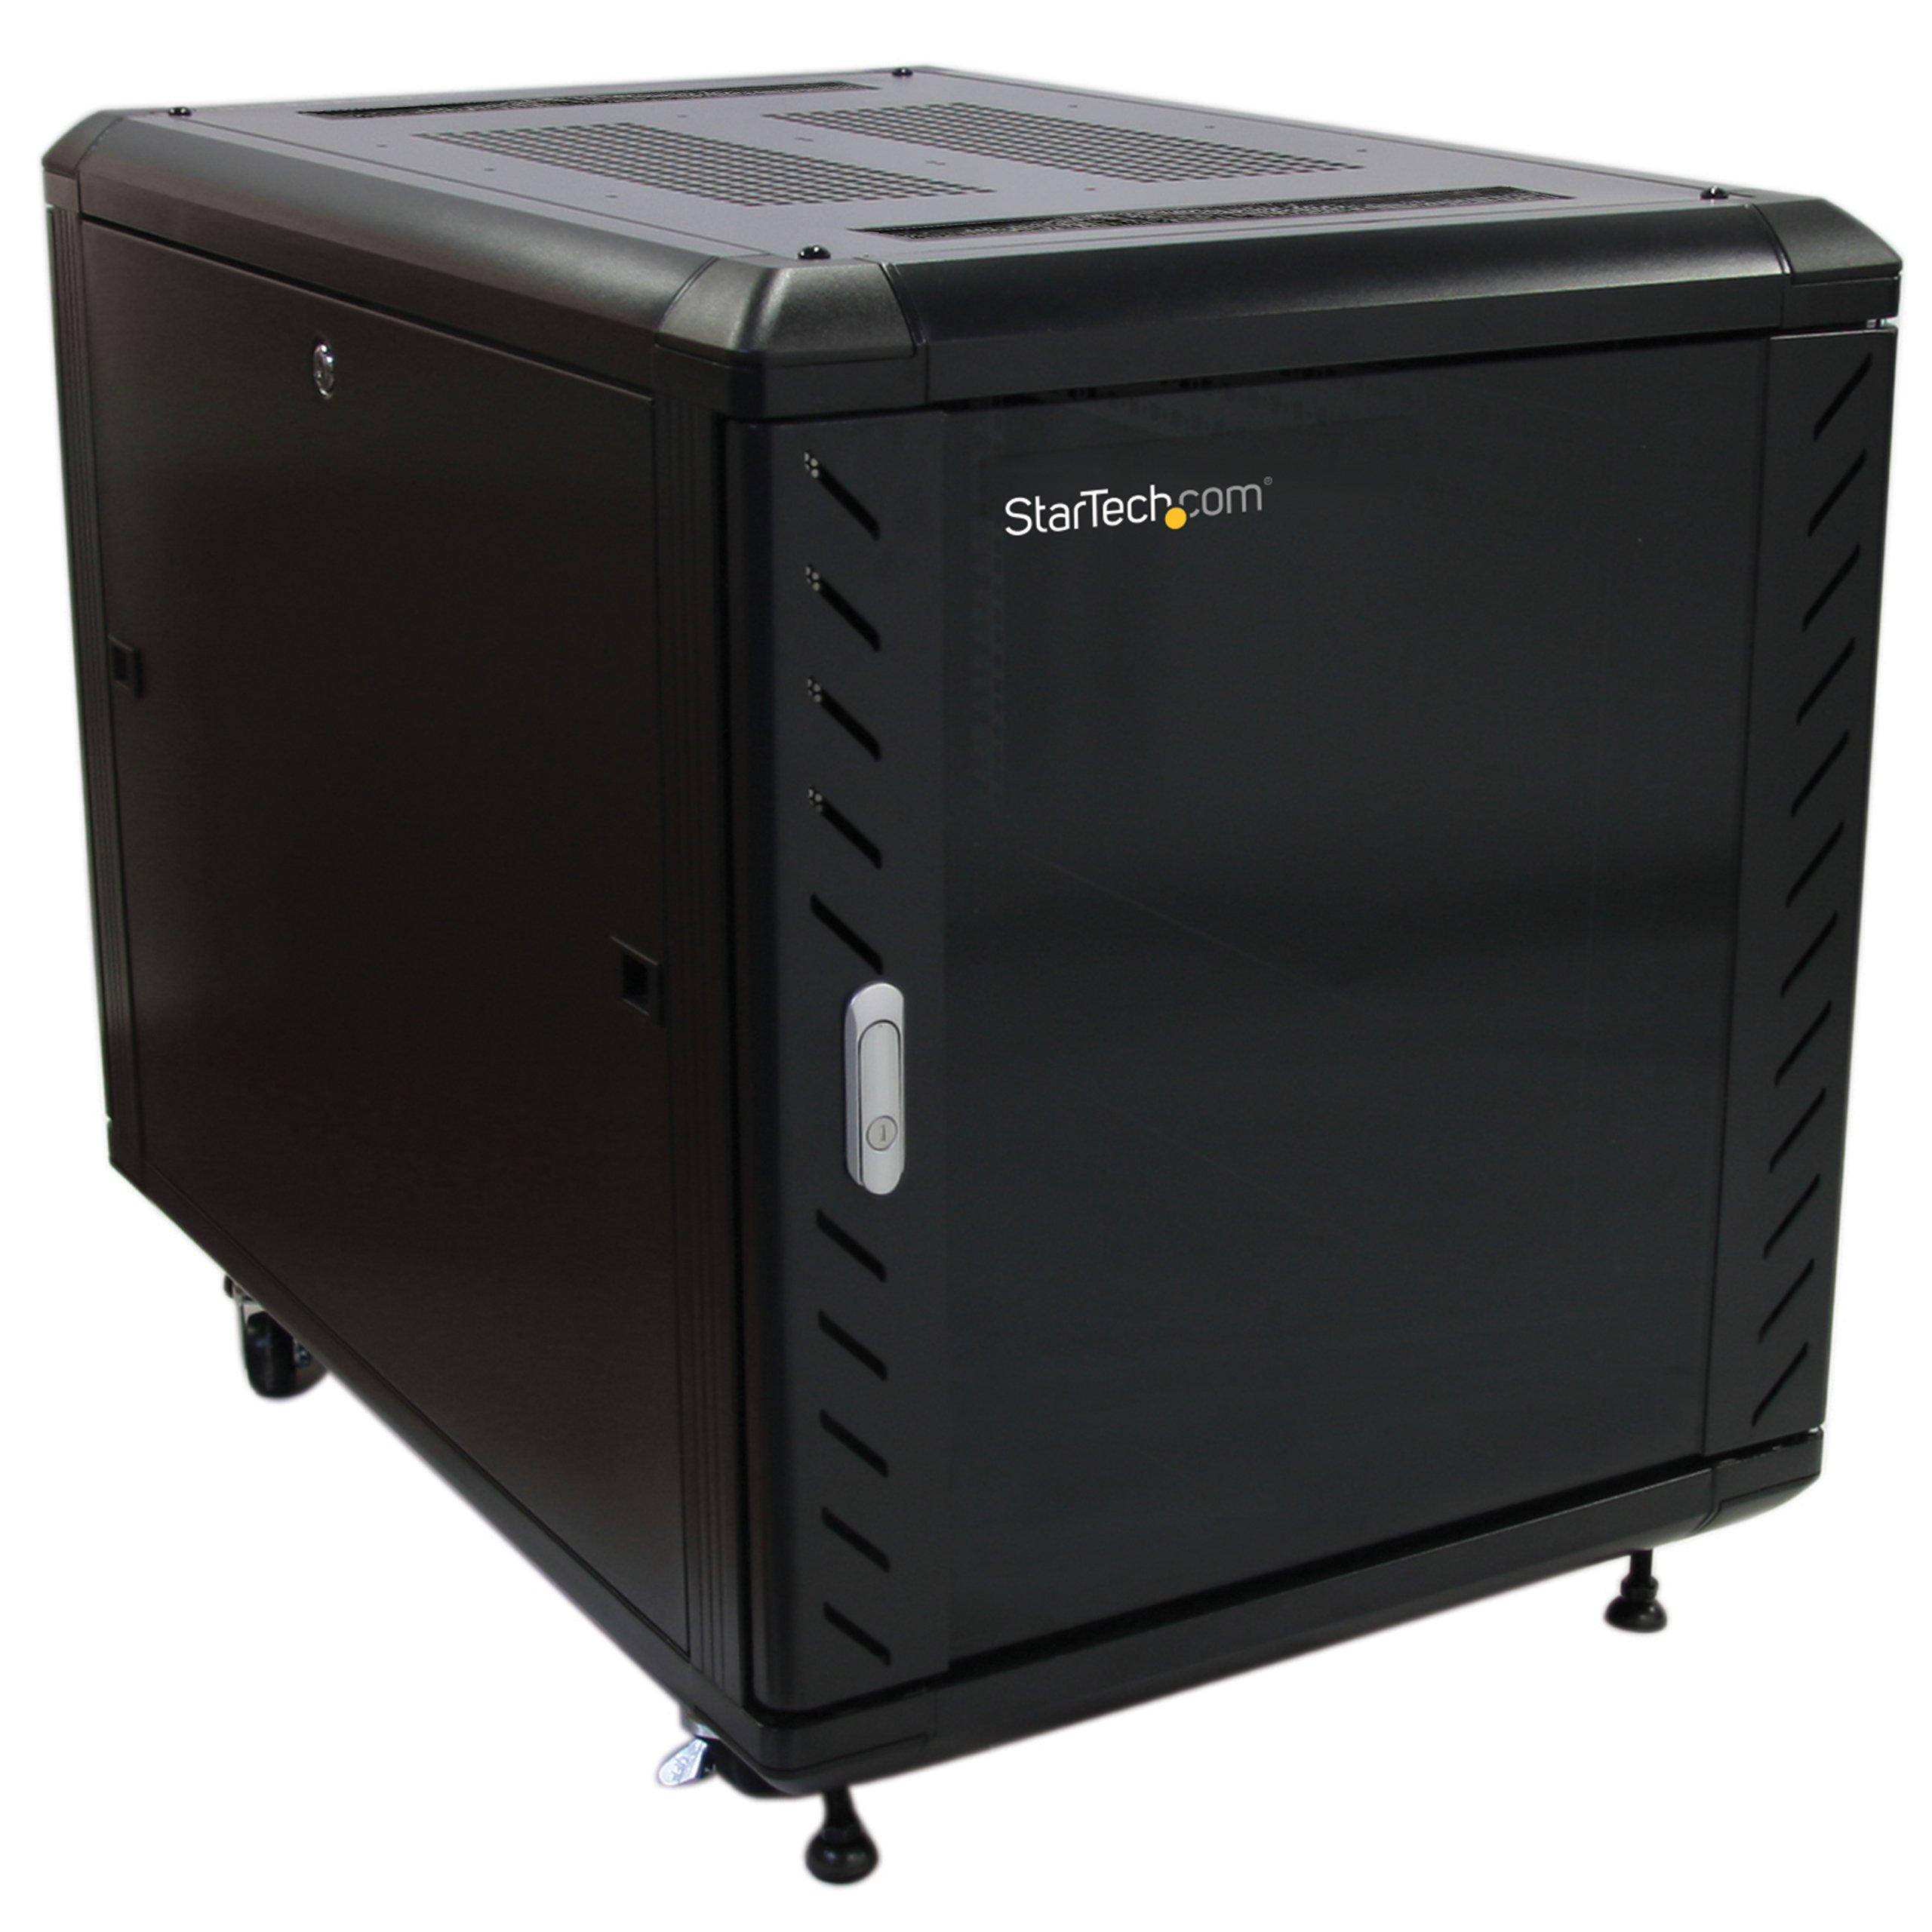 StarTech.com Portable Server Rack Cabinet - 12U Server Rack - 36in - with Glass Door - Network Cabinet - Rolling Server Rack with Casters